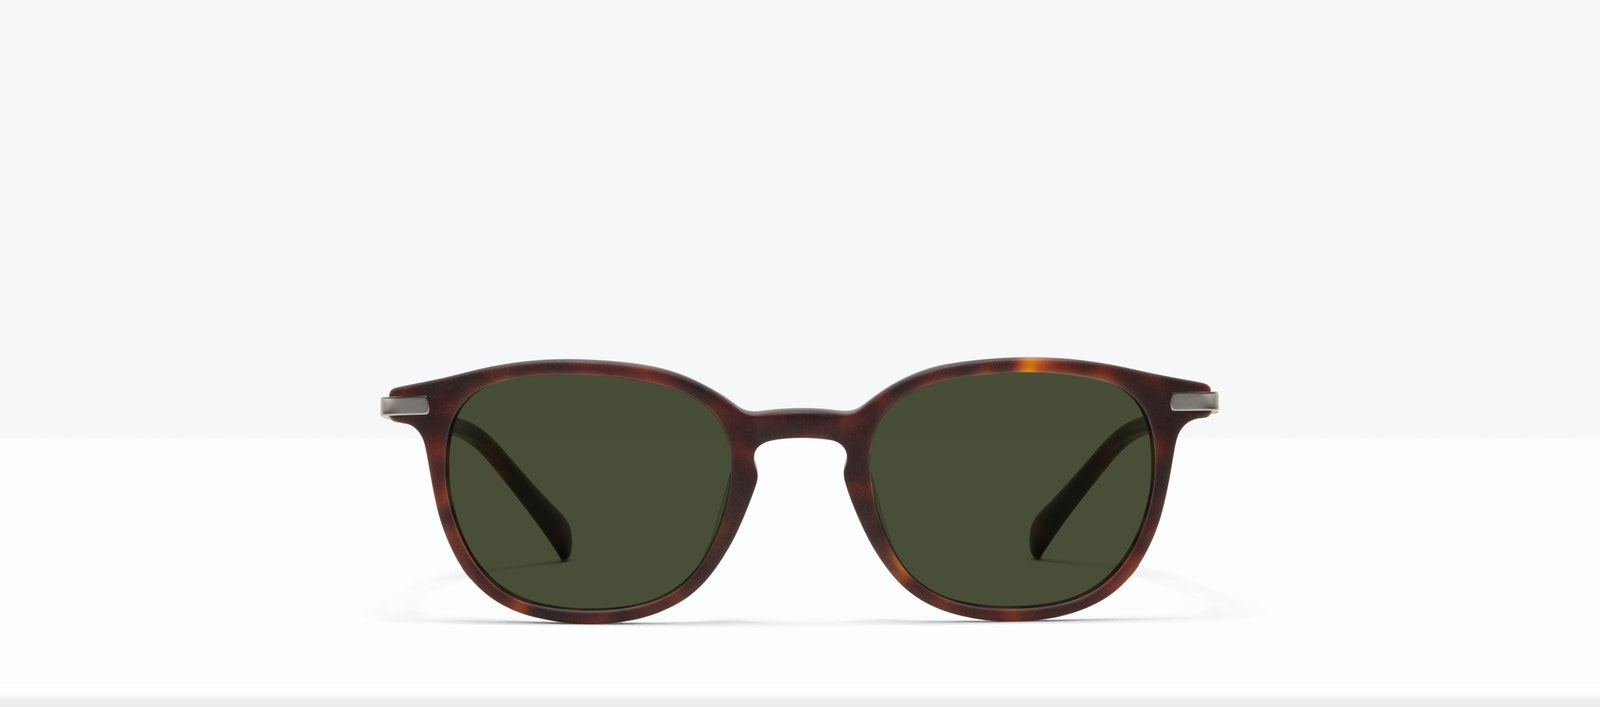 Affordable Fashion Glasses Round Sunglasses Men Tux M Matte Tort Front